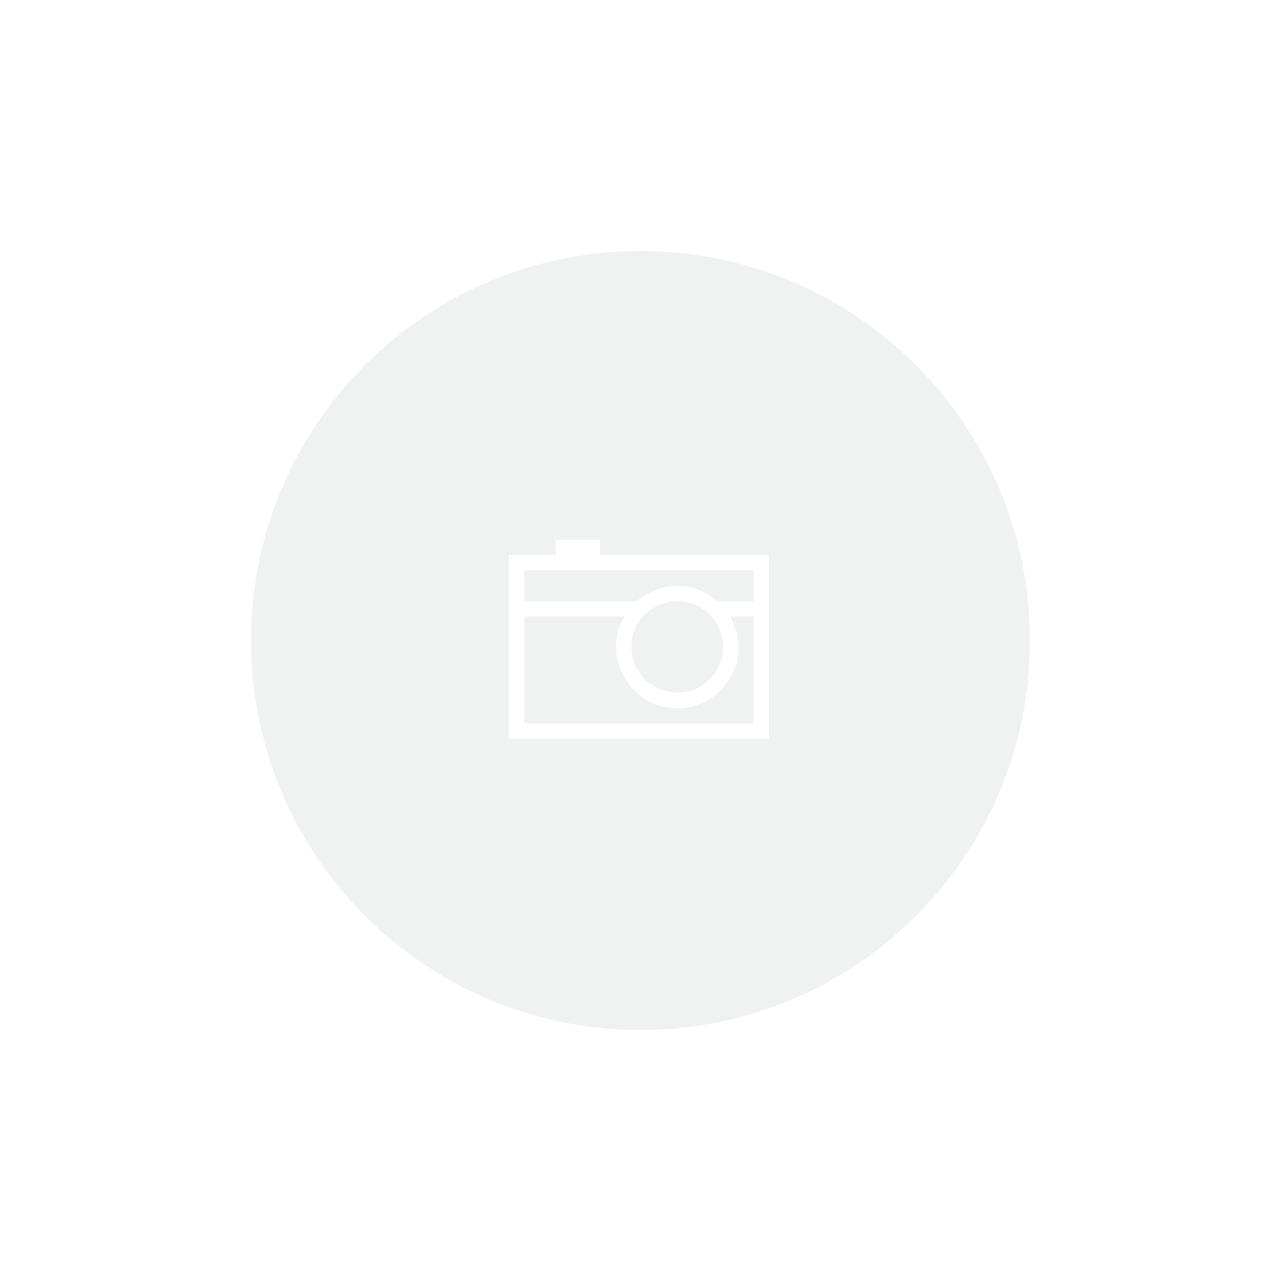 EIXO TRASEIRO JOYTECH COMPLETO FURADO P/ BLOCAGEM (10X145mm)